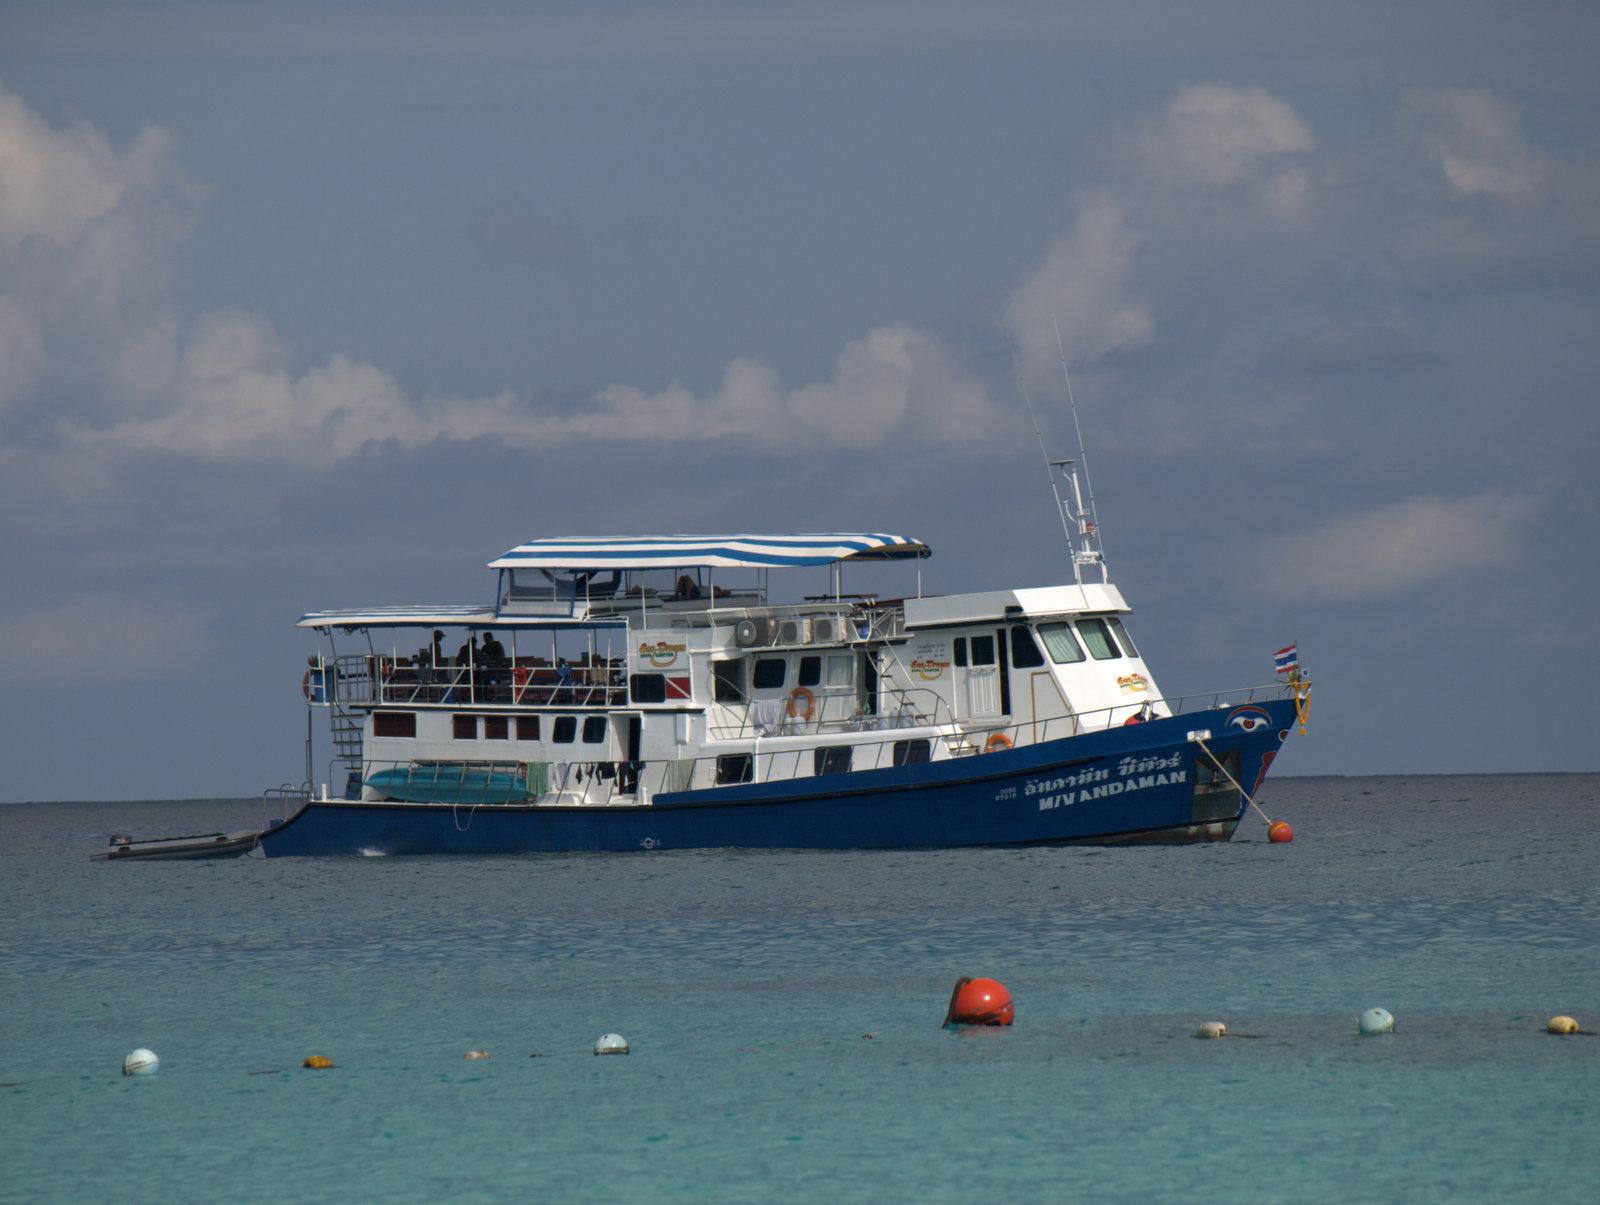 Andaman - vores skib